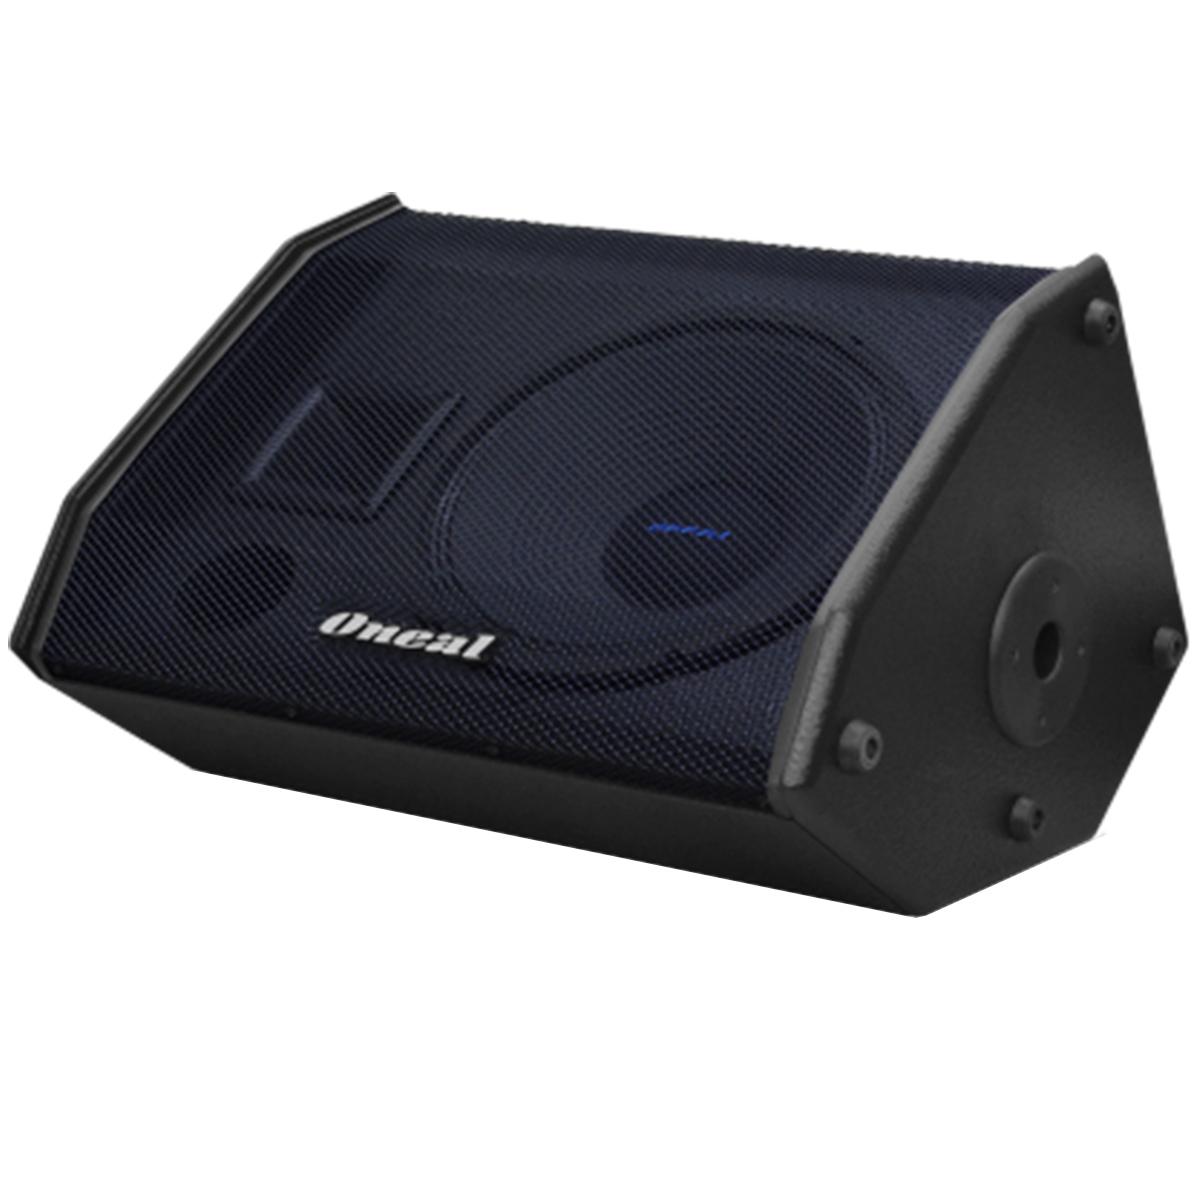 Monitor Ativo Fal 15 Pol 600W - OPM 3050 Oneal